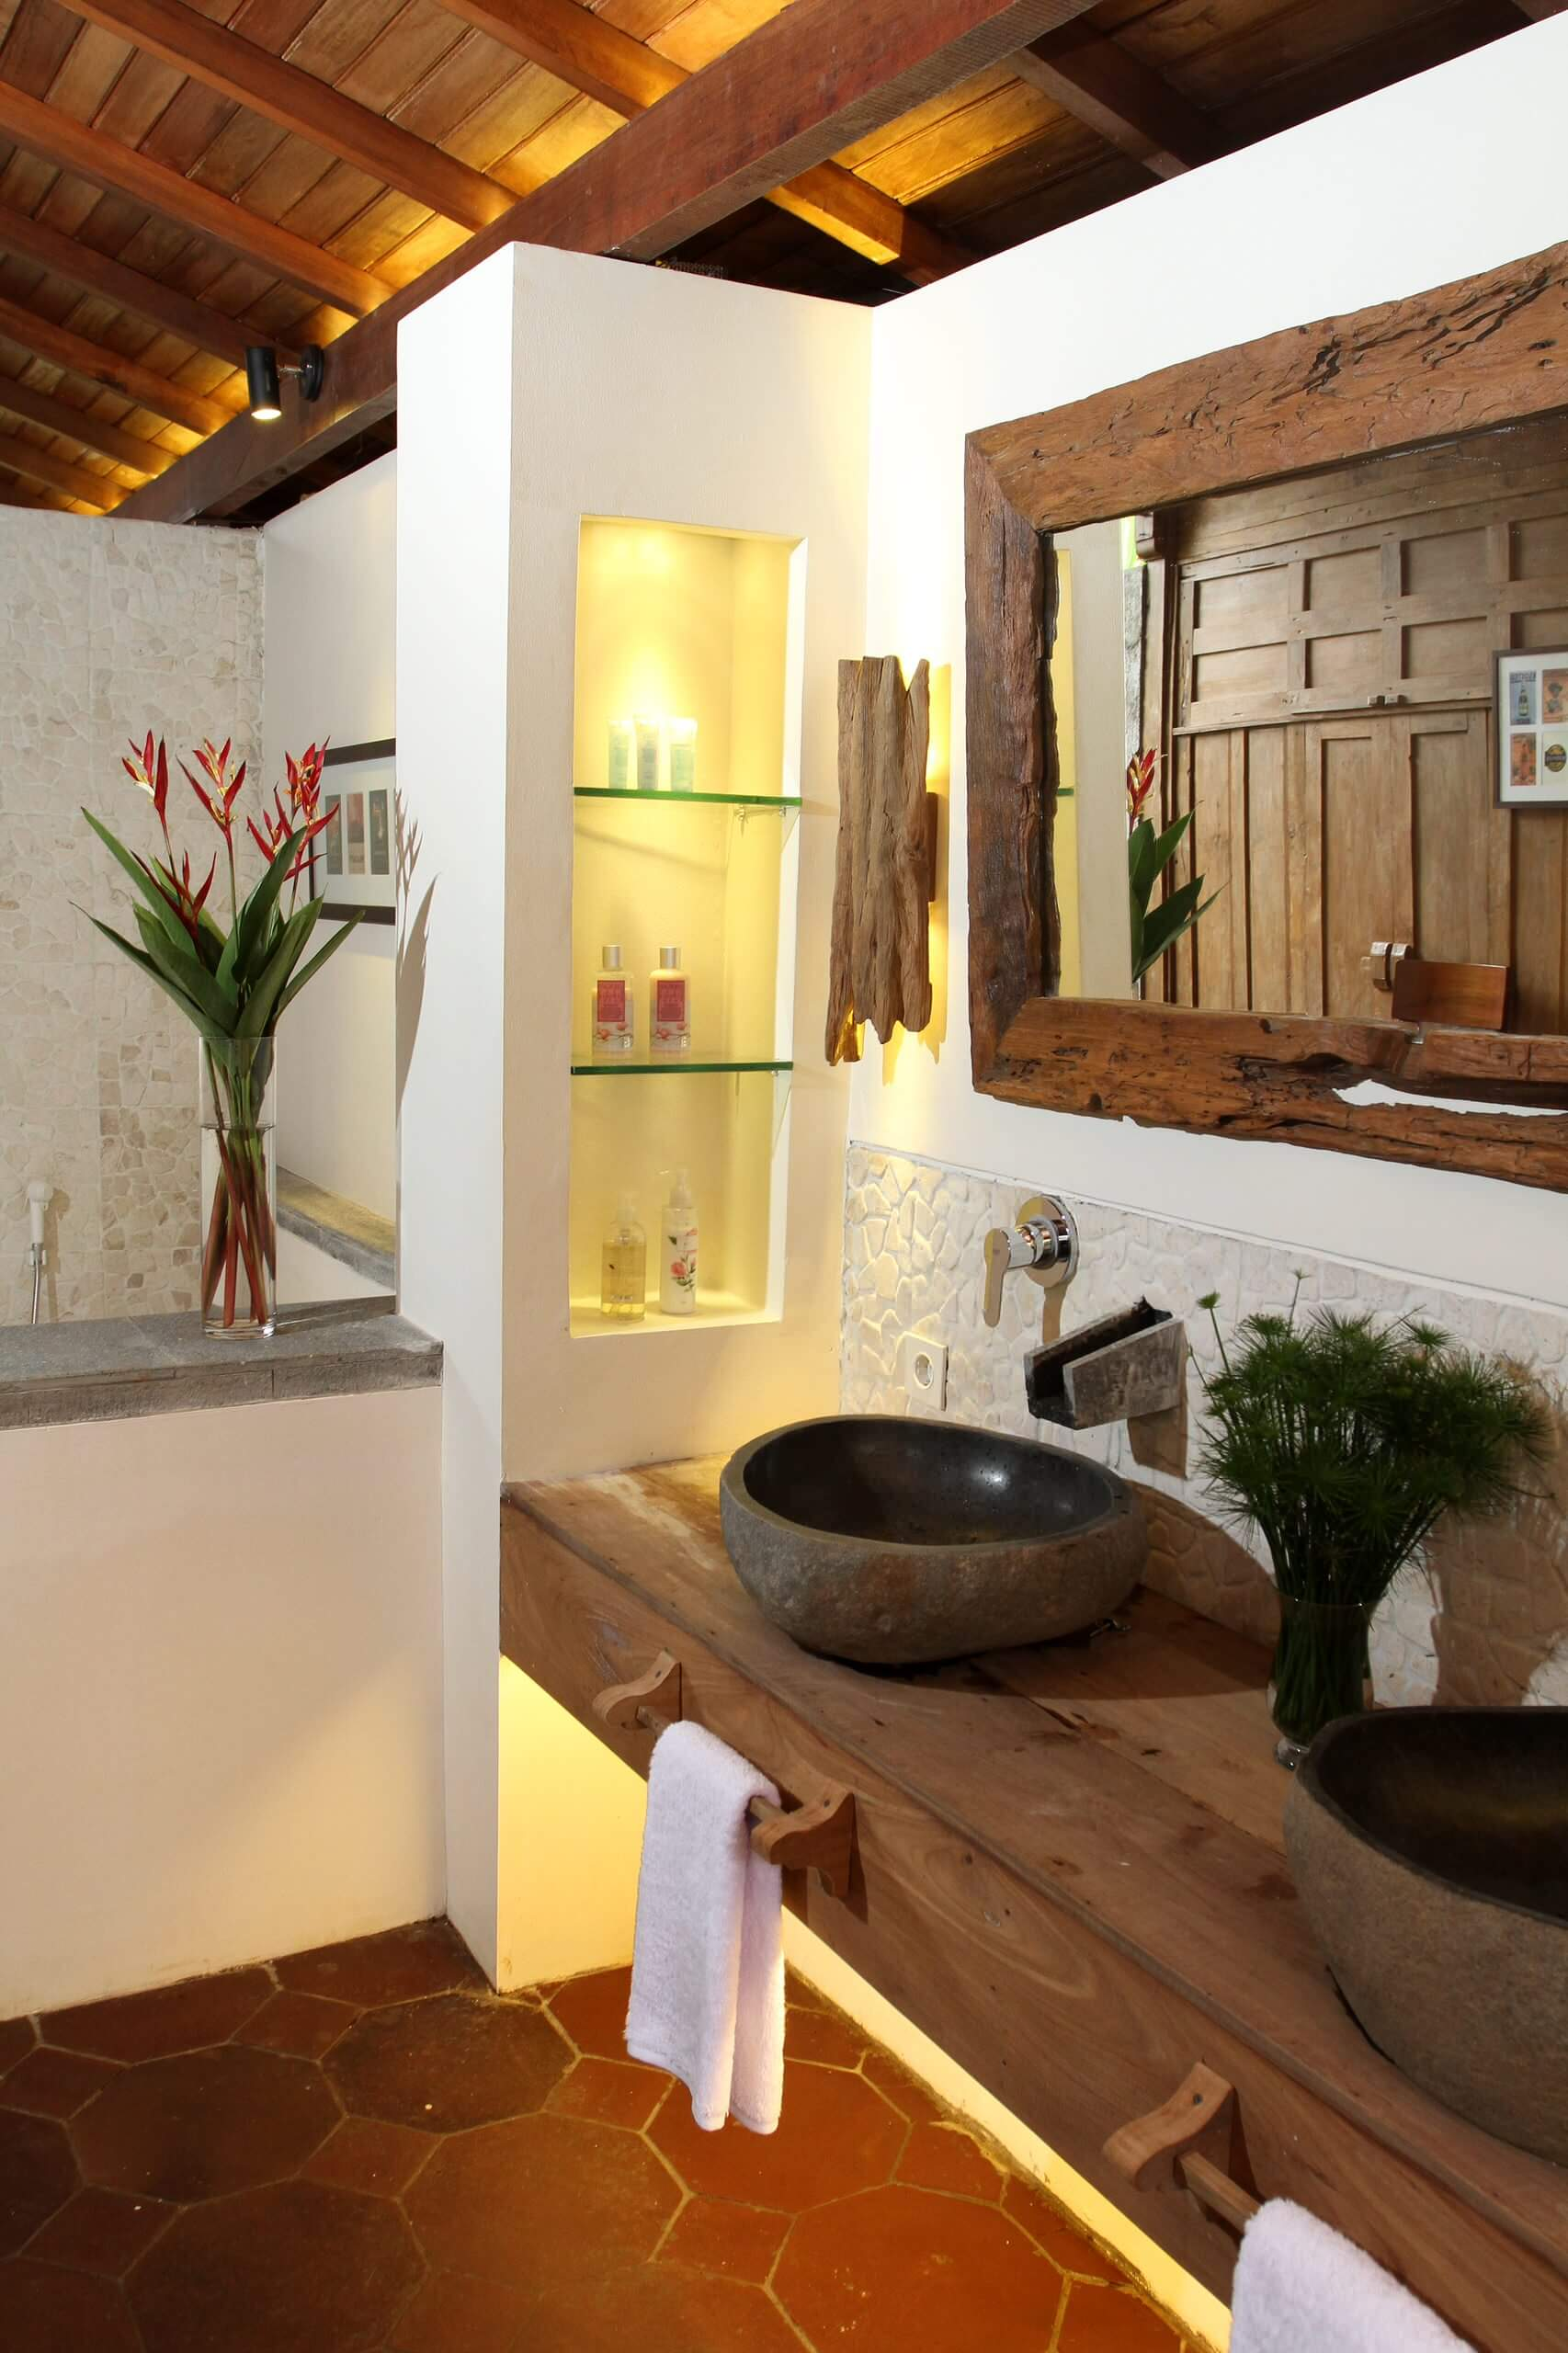 A Rustic Spa Bathroom Concept